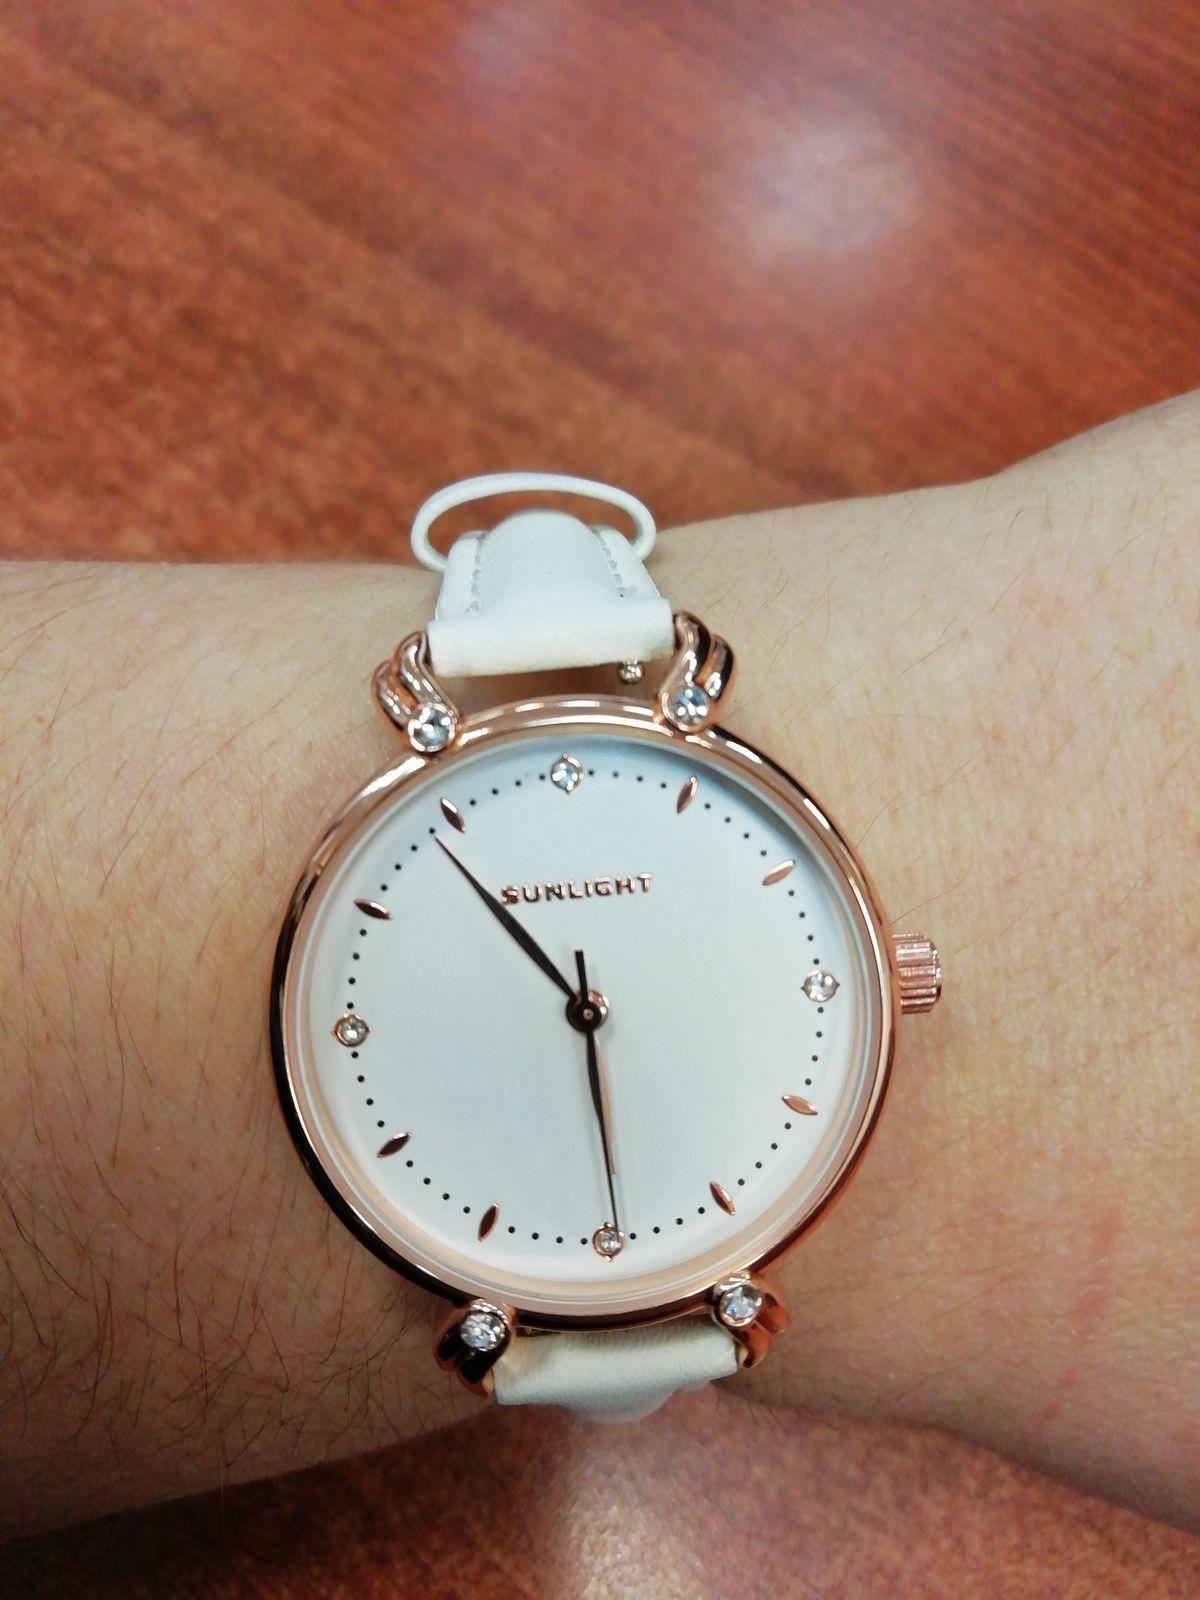 Женские часы Sinlight